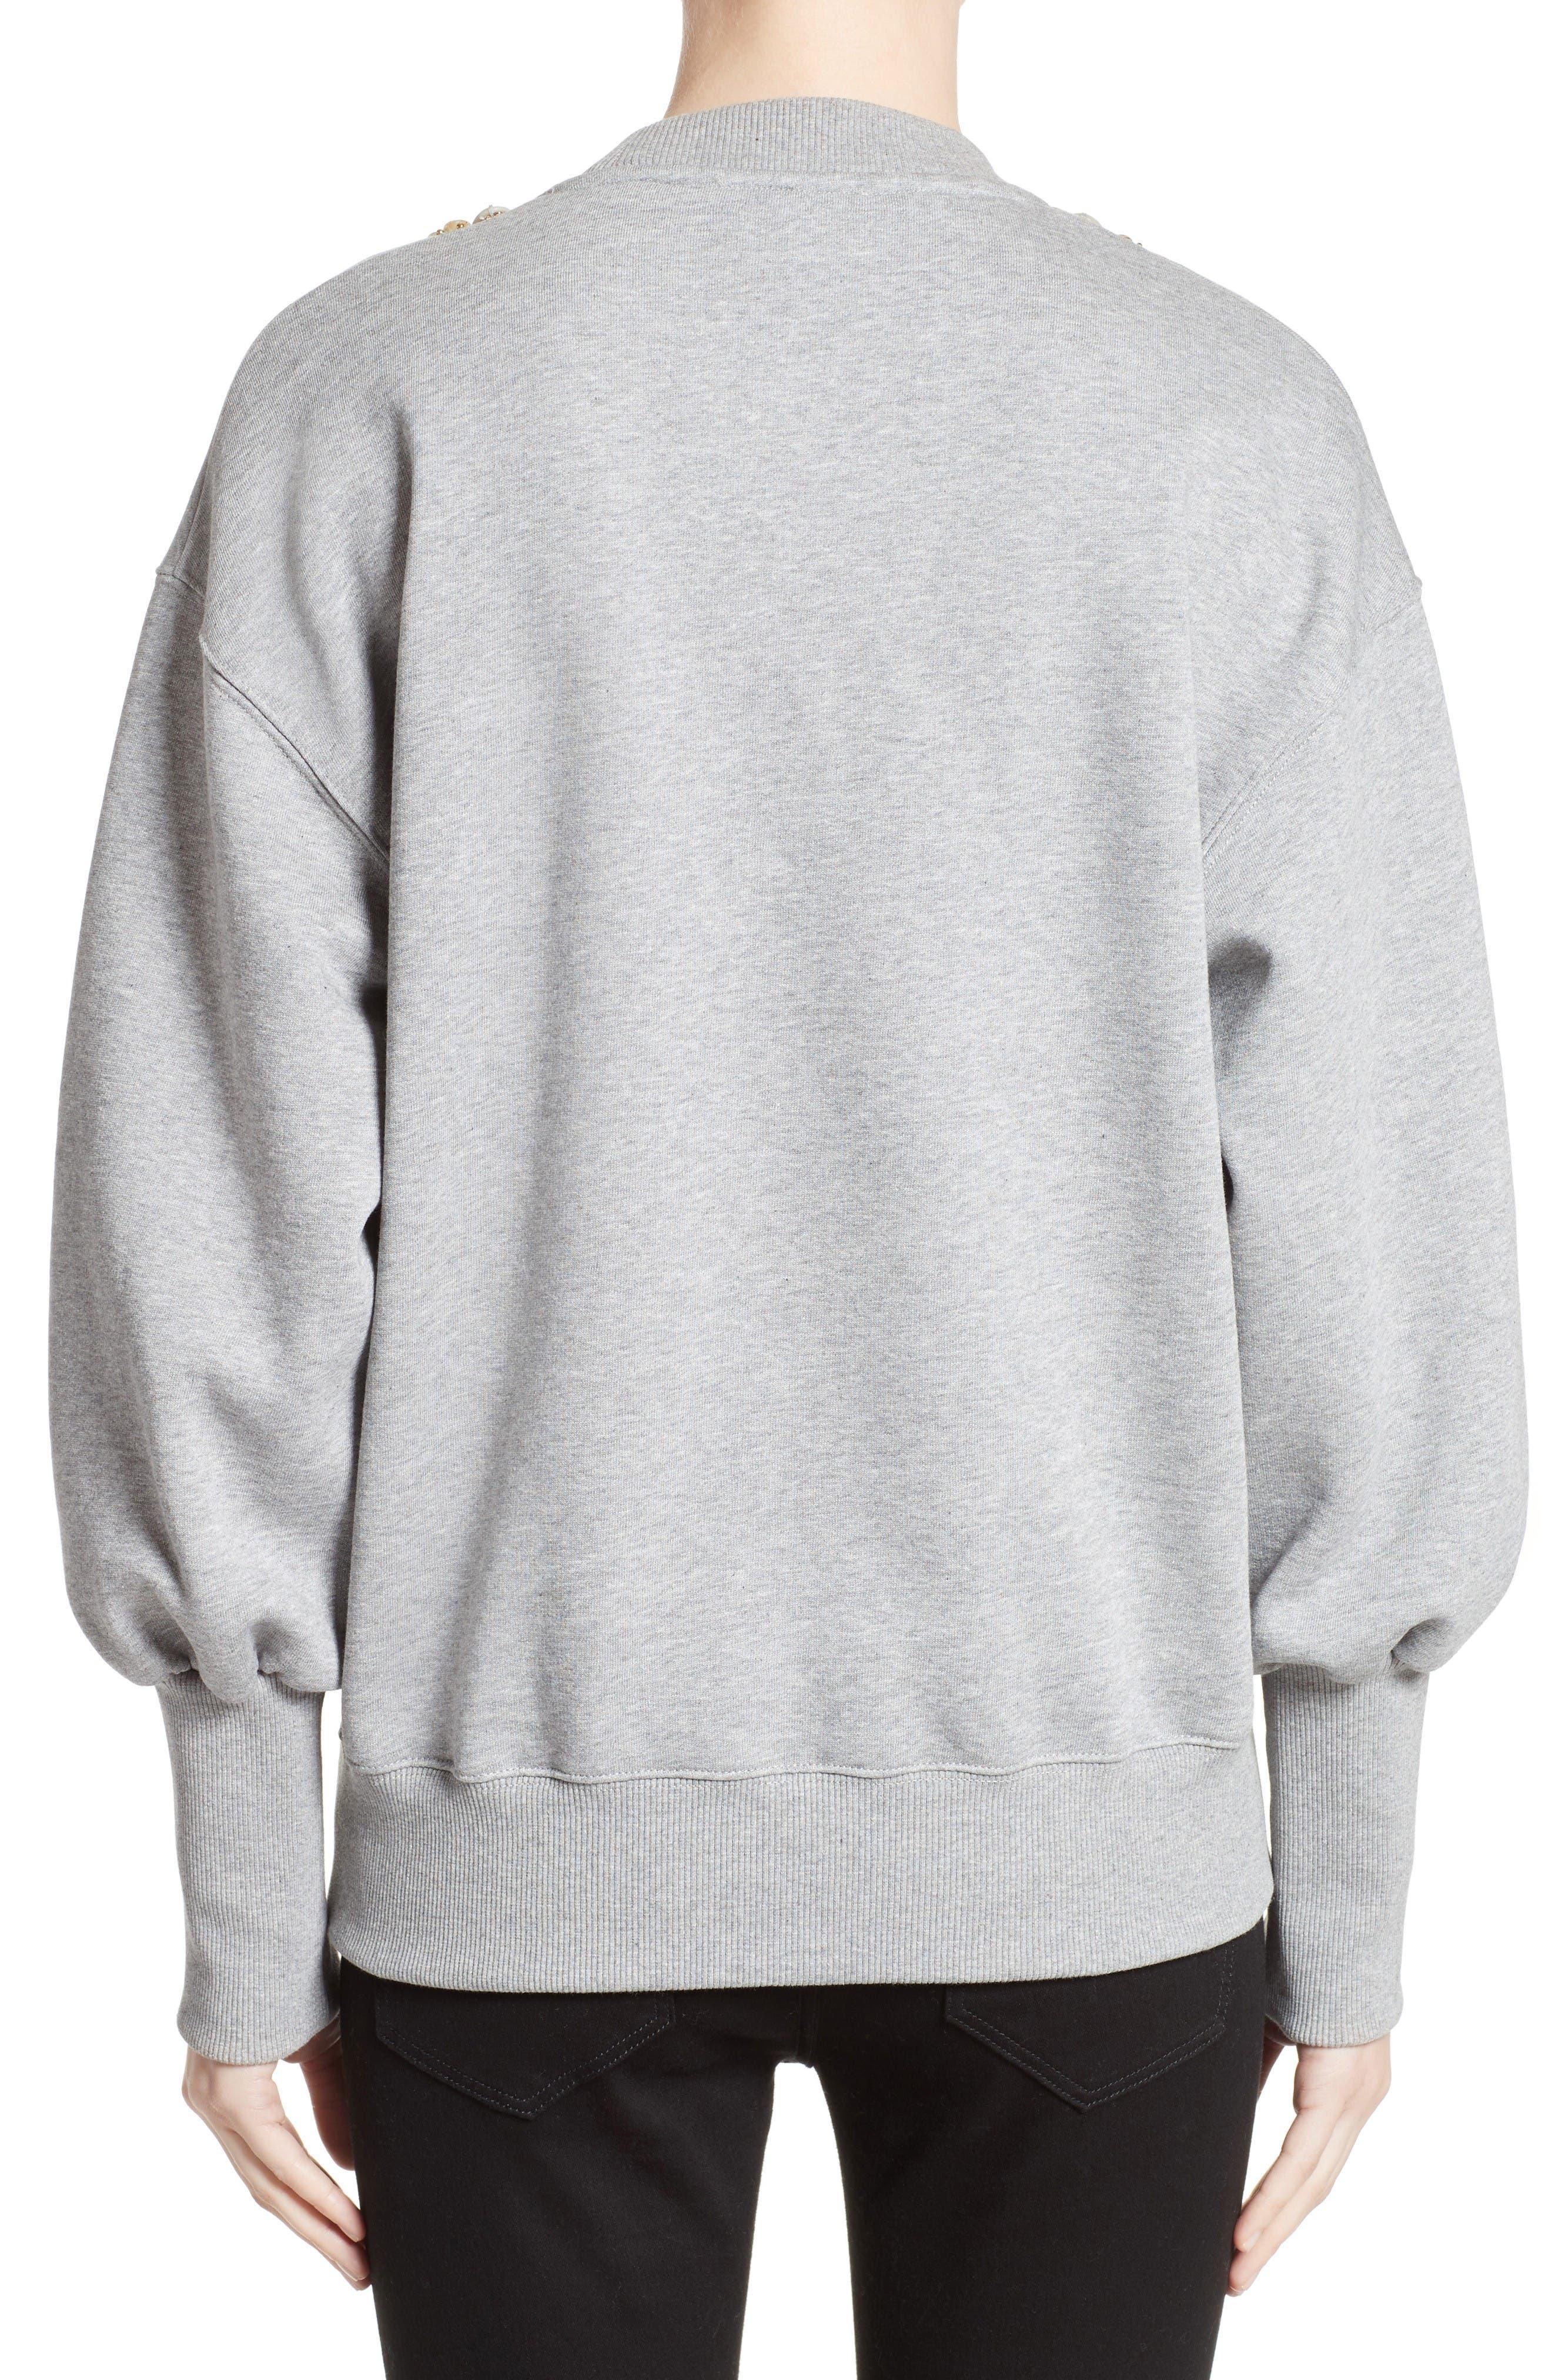 Juliano Embellished Sweatshirt,                             Alternate thumbnail 2, color,                             Pale Grey Melange